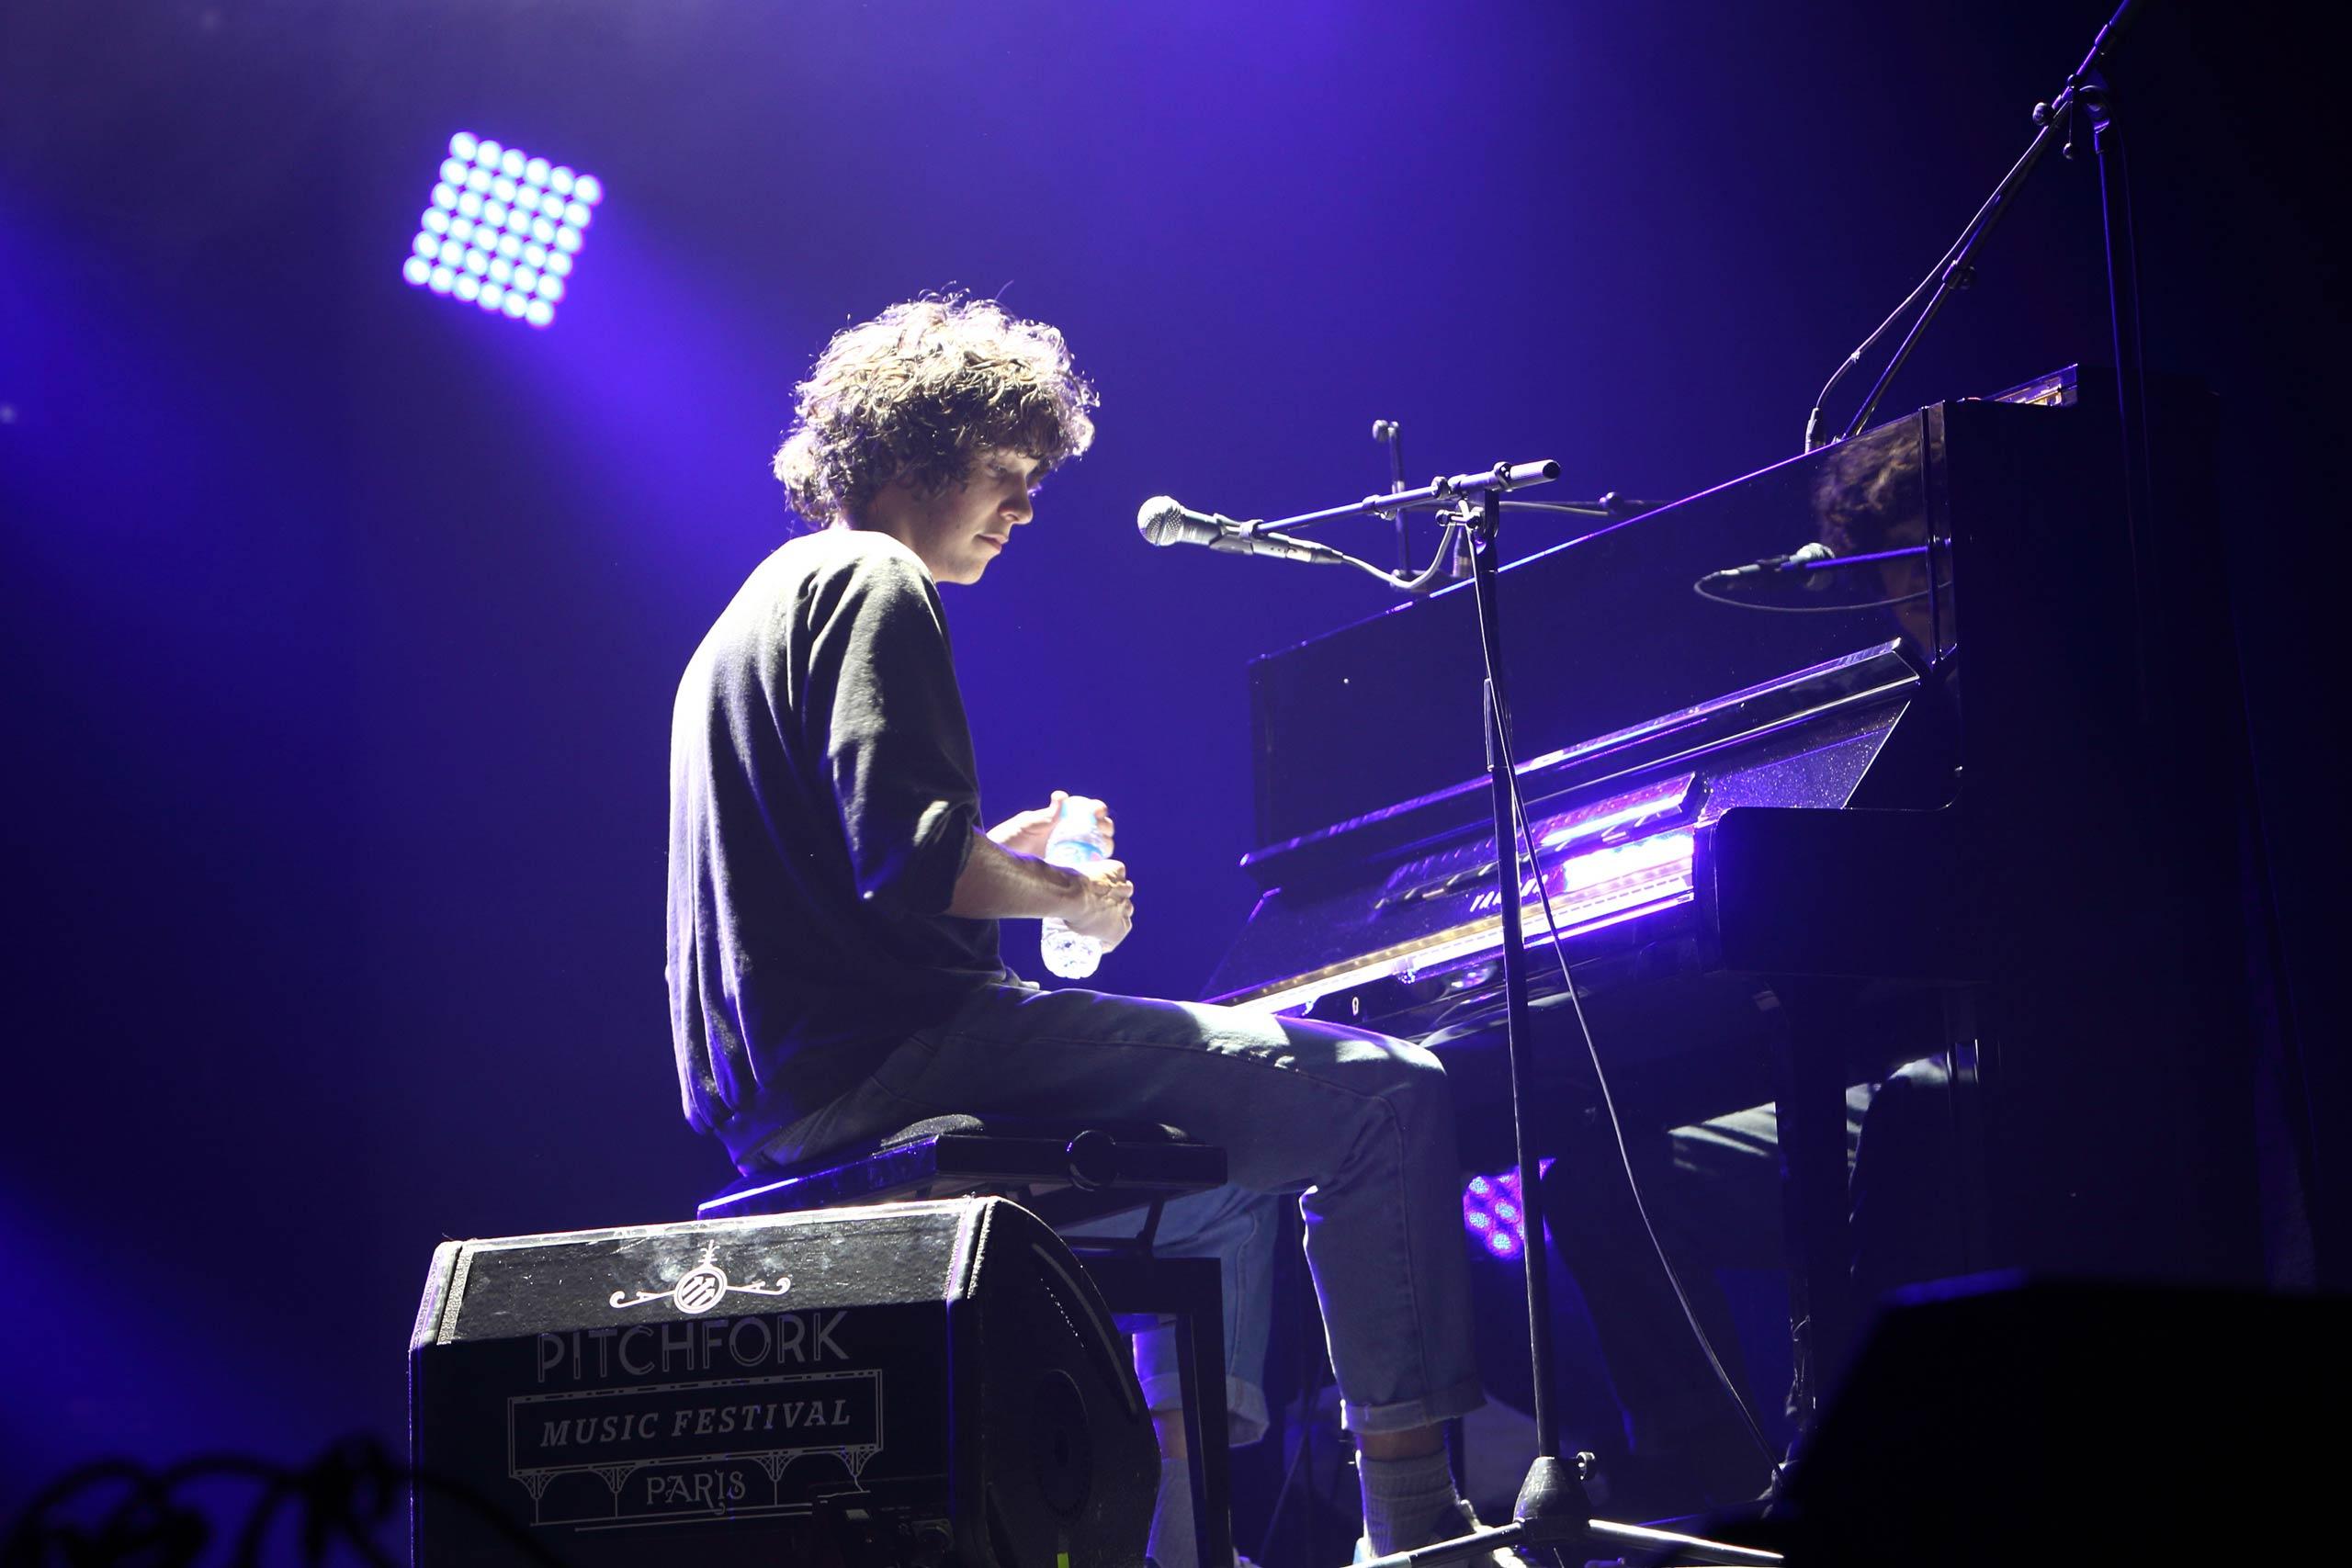 Pitchfork Music Festival Paris 2014 - Day 3